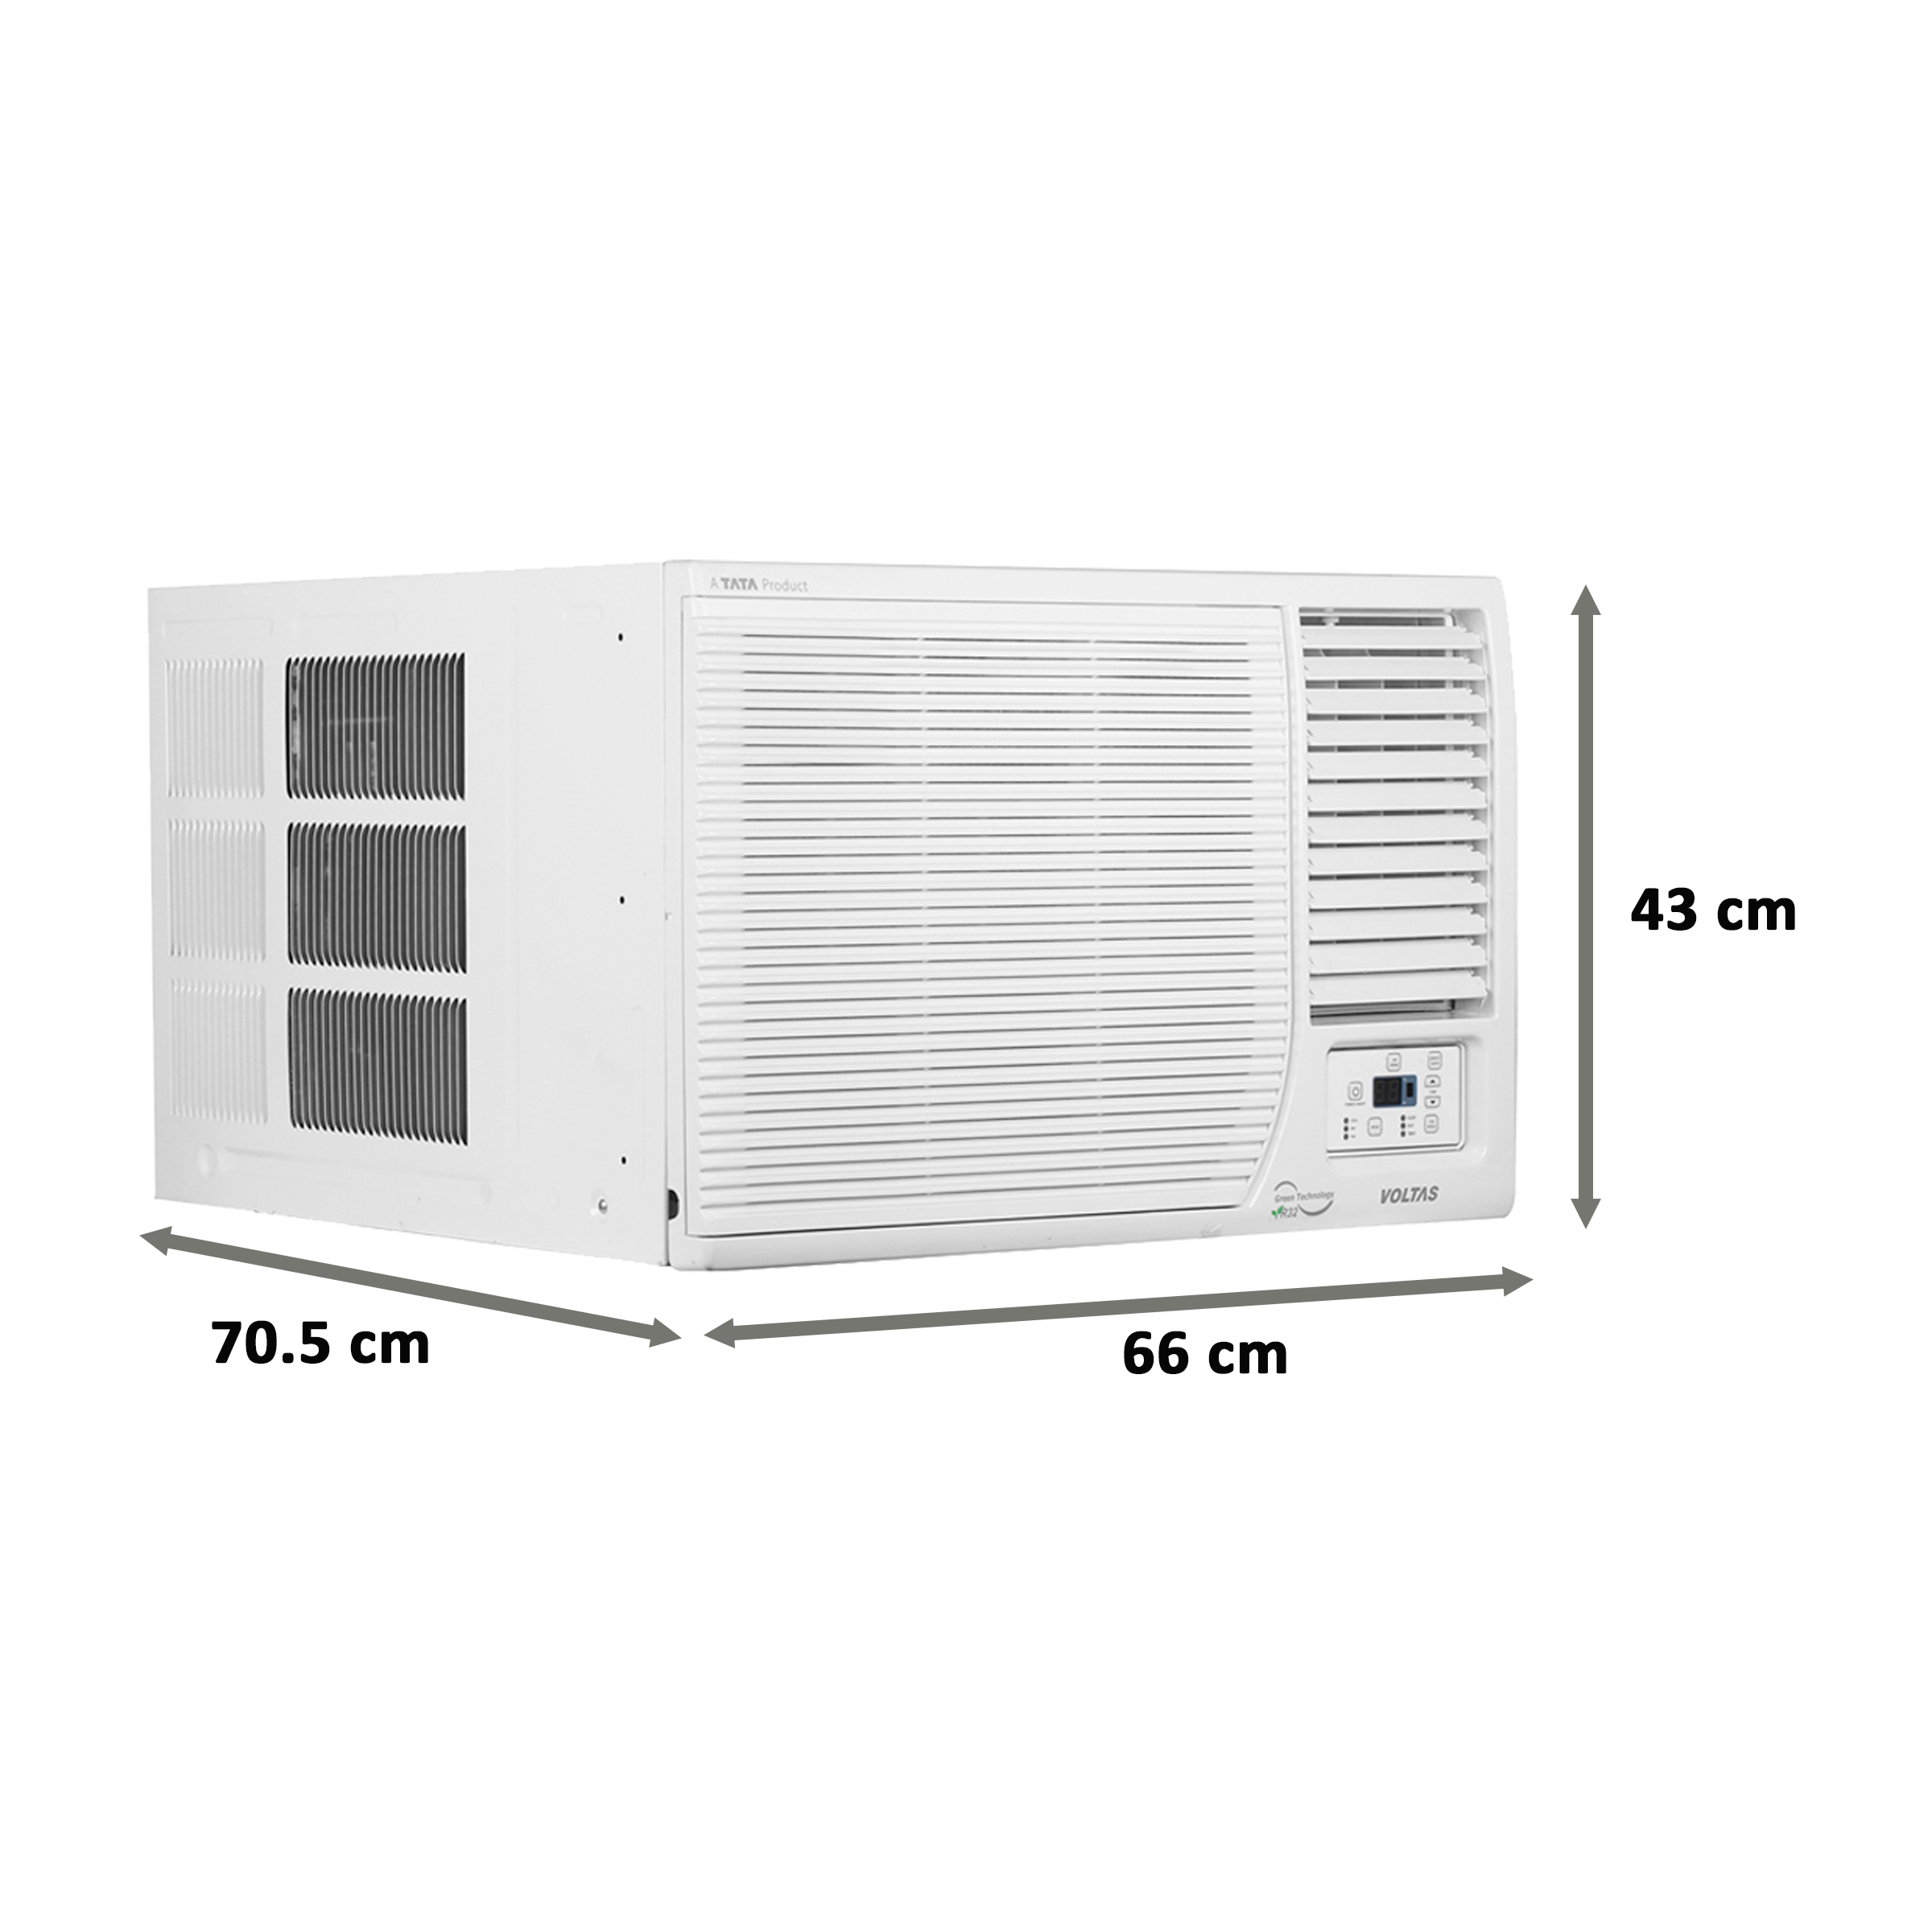 Voltas 1.5 Ton 3 Star Inverter Window AC (Hot and Cold, Copper Condenser, 18H DZB, White)_2